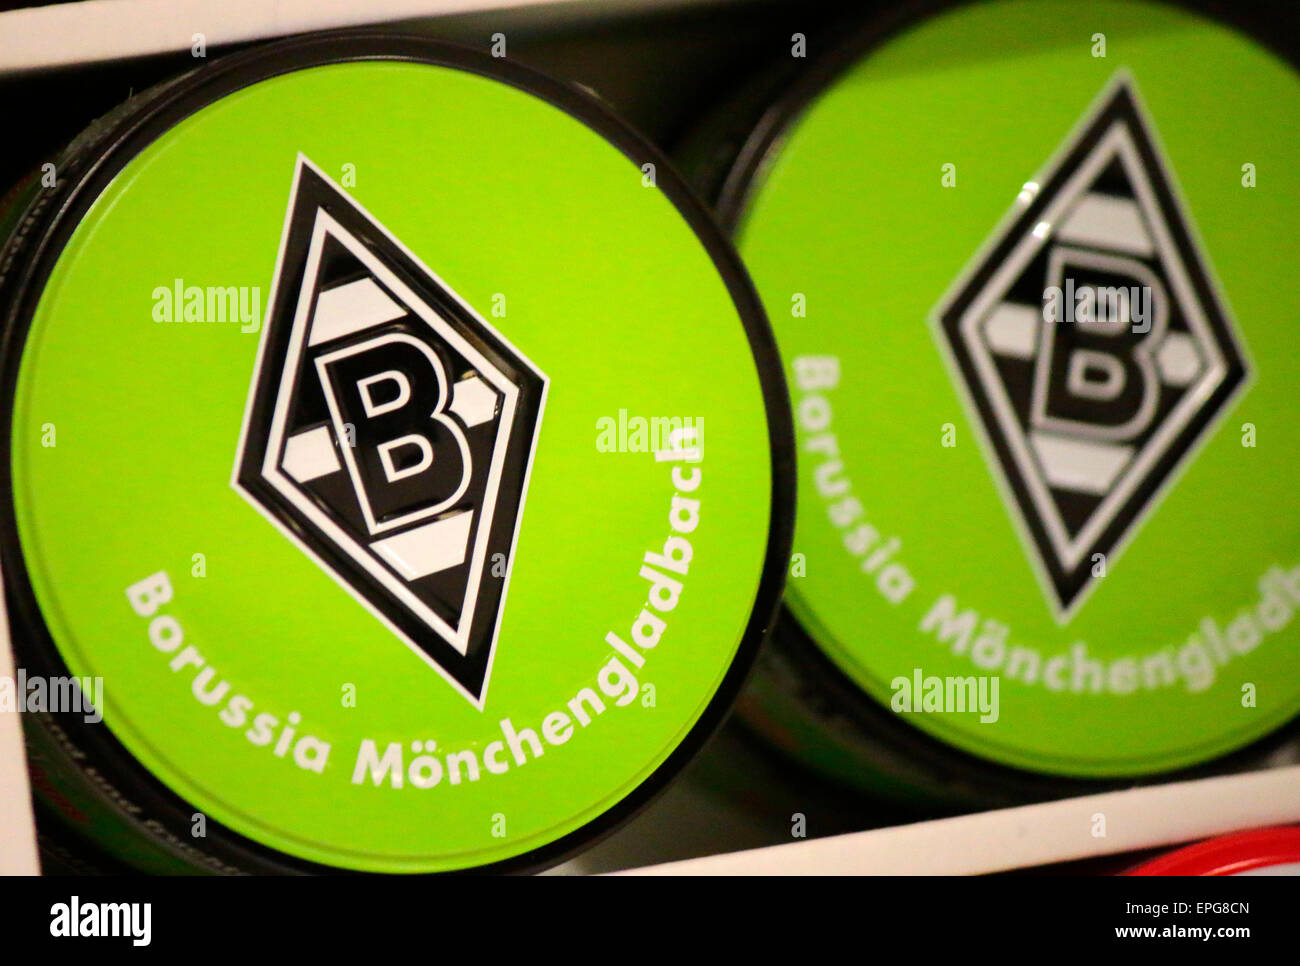 Markennamen: 'Borussia Moenchengladbach', Berlin. - Stock Image